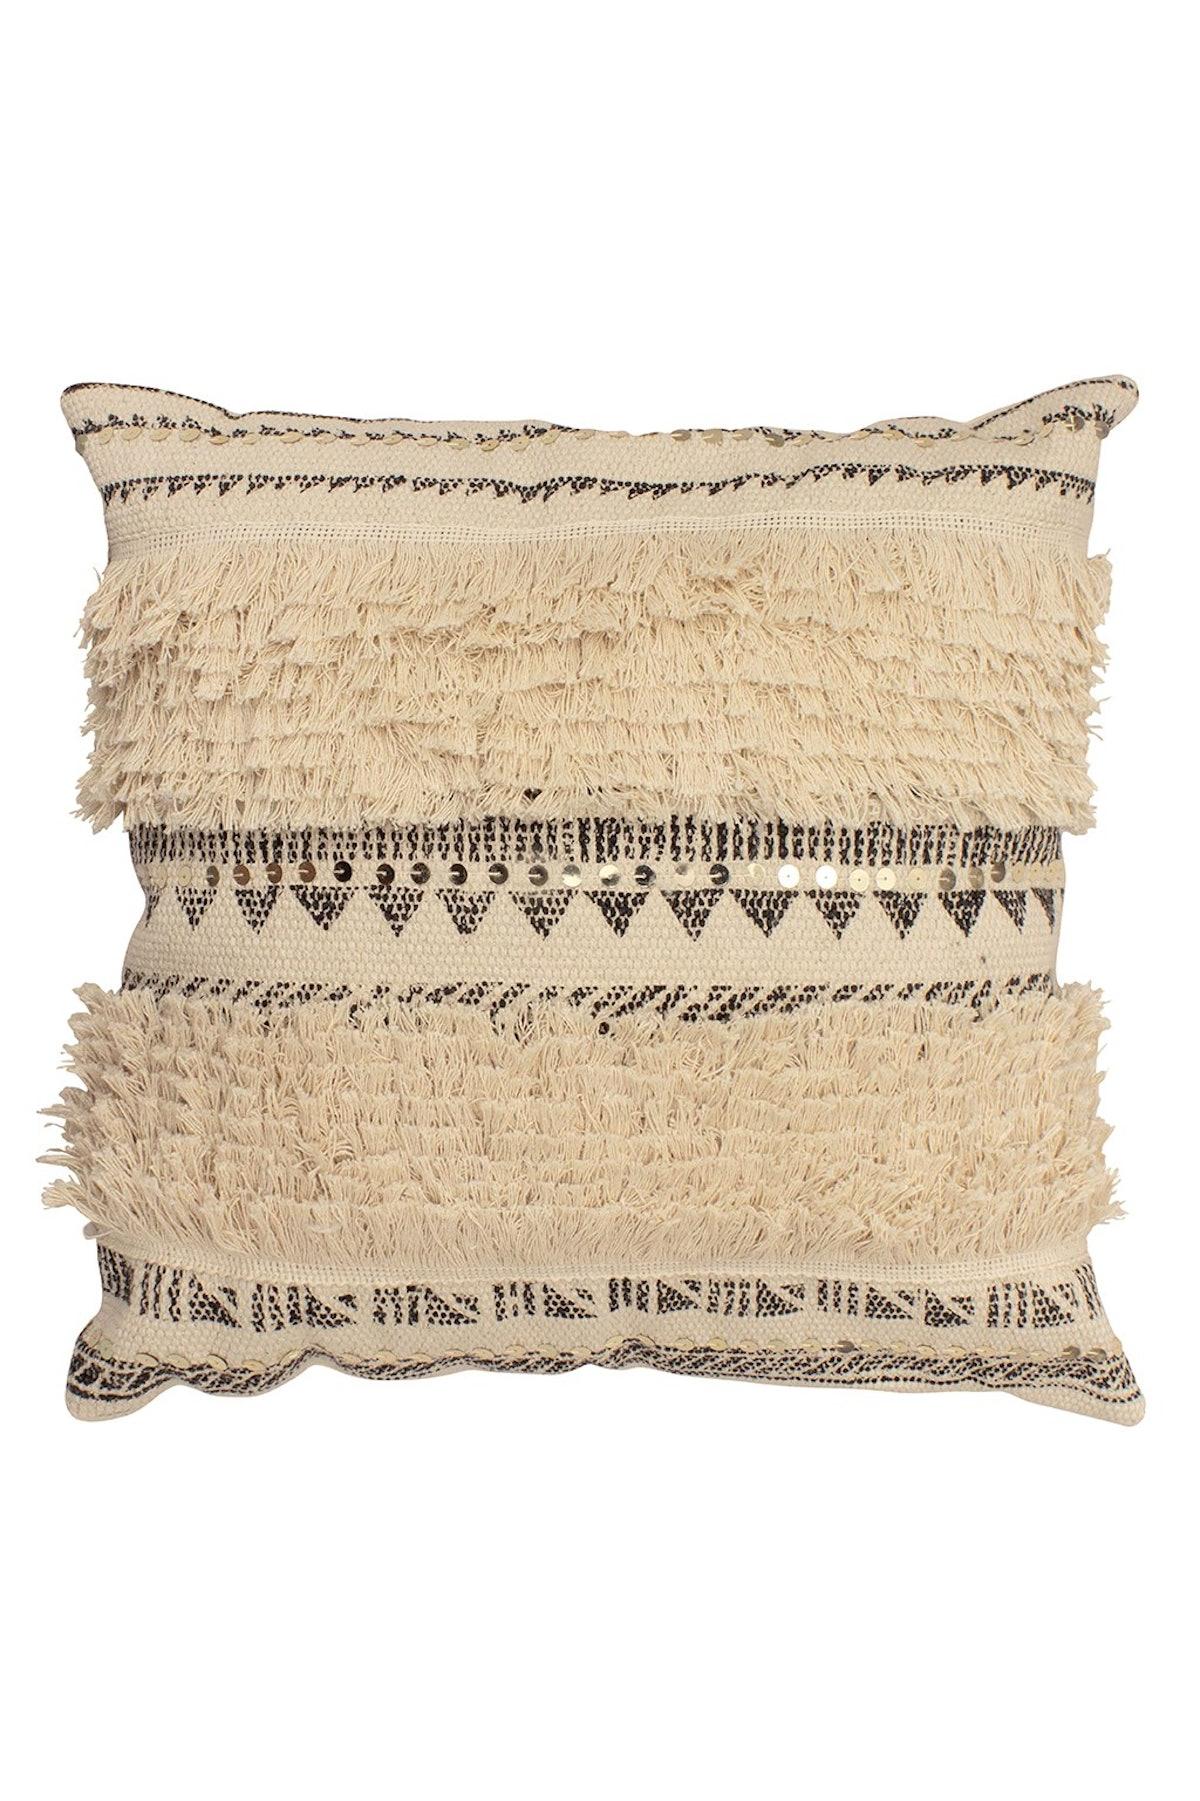 Nomad Decorative Pillow